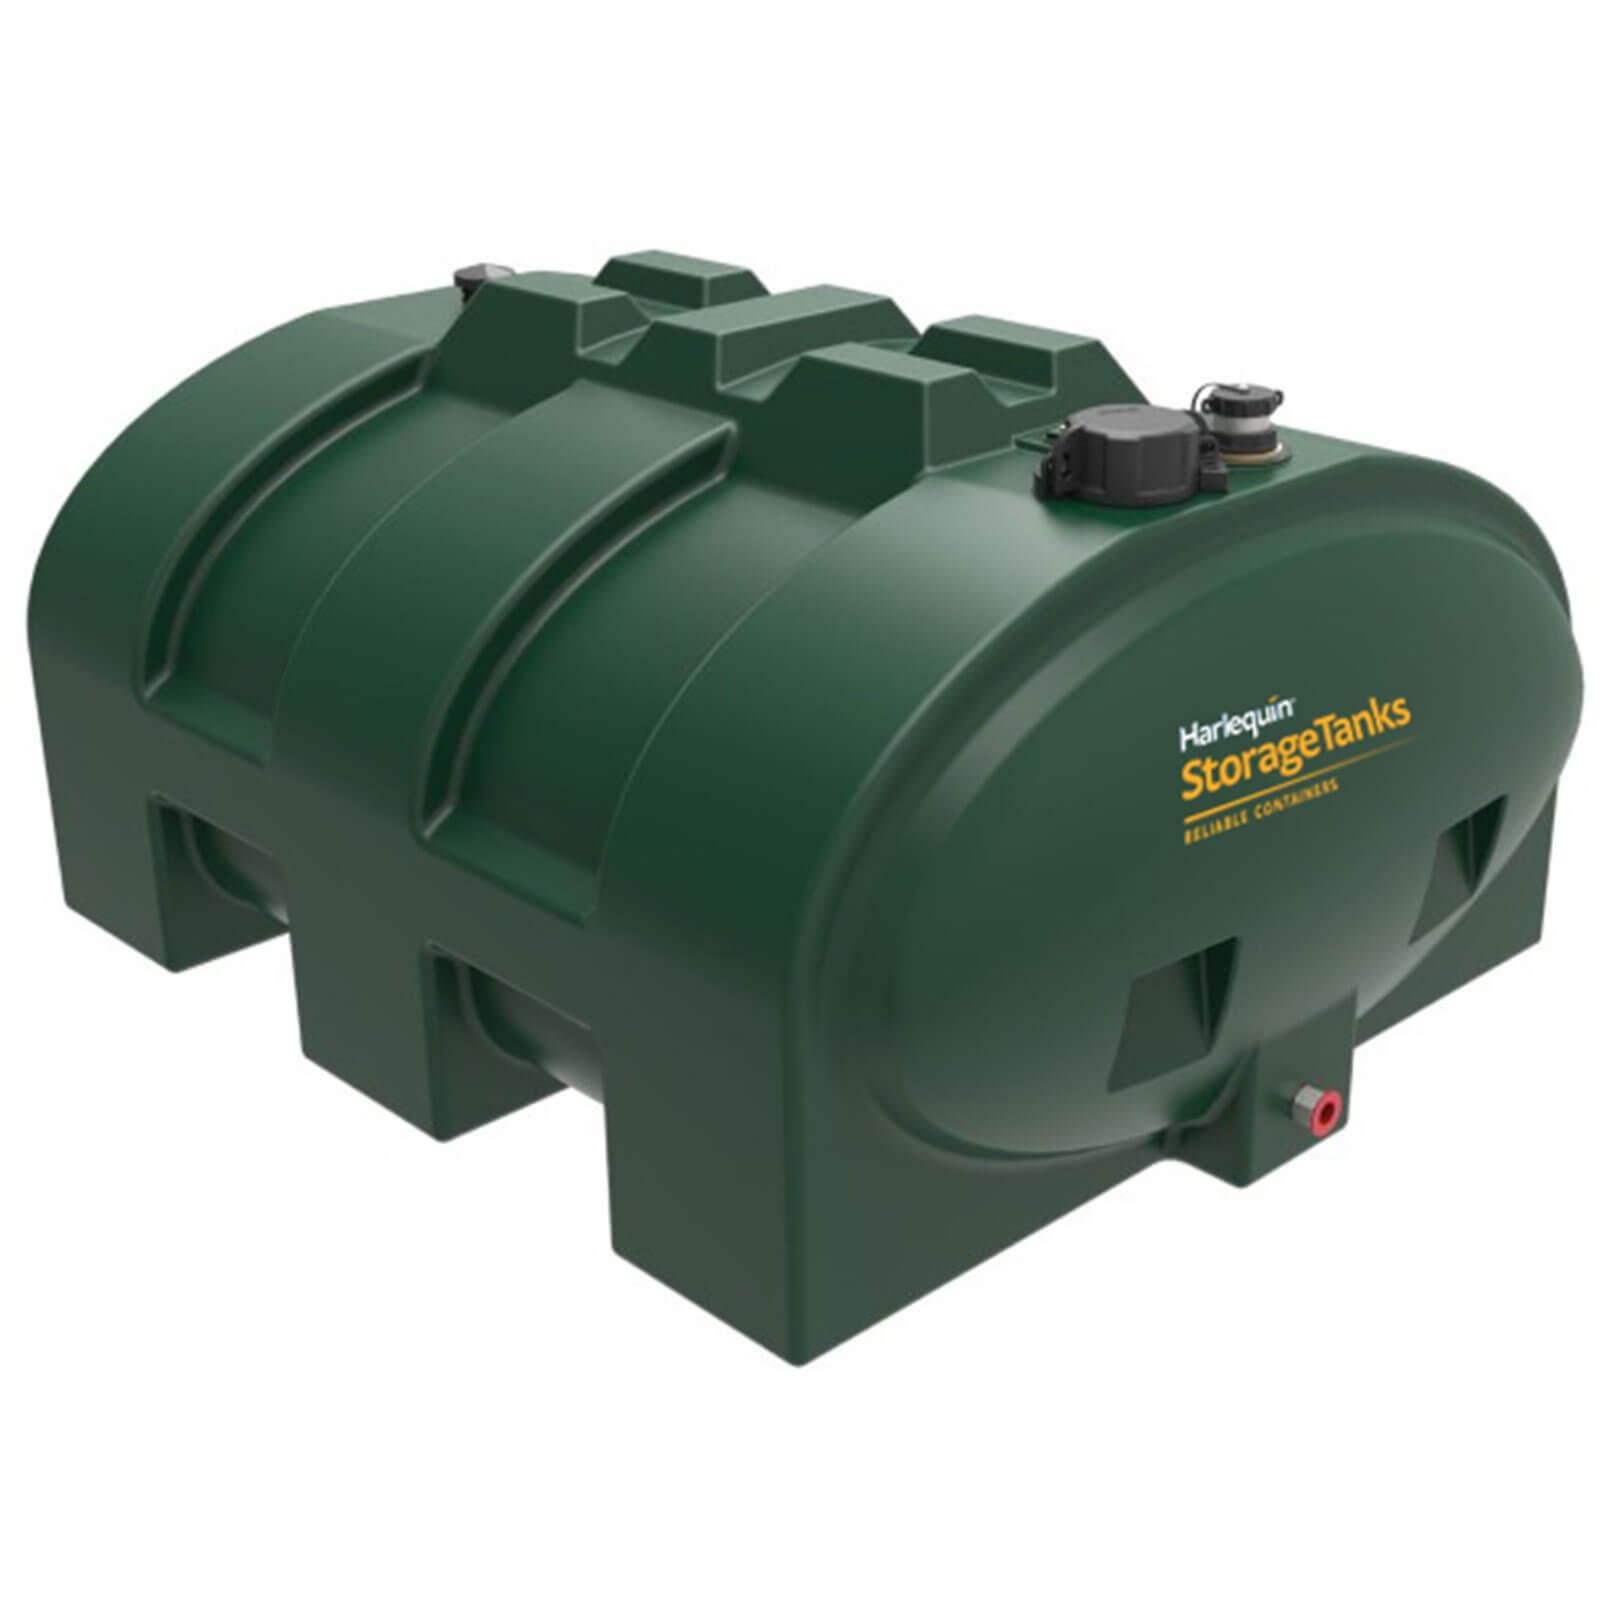 1200 litre low profile green plastic tank